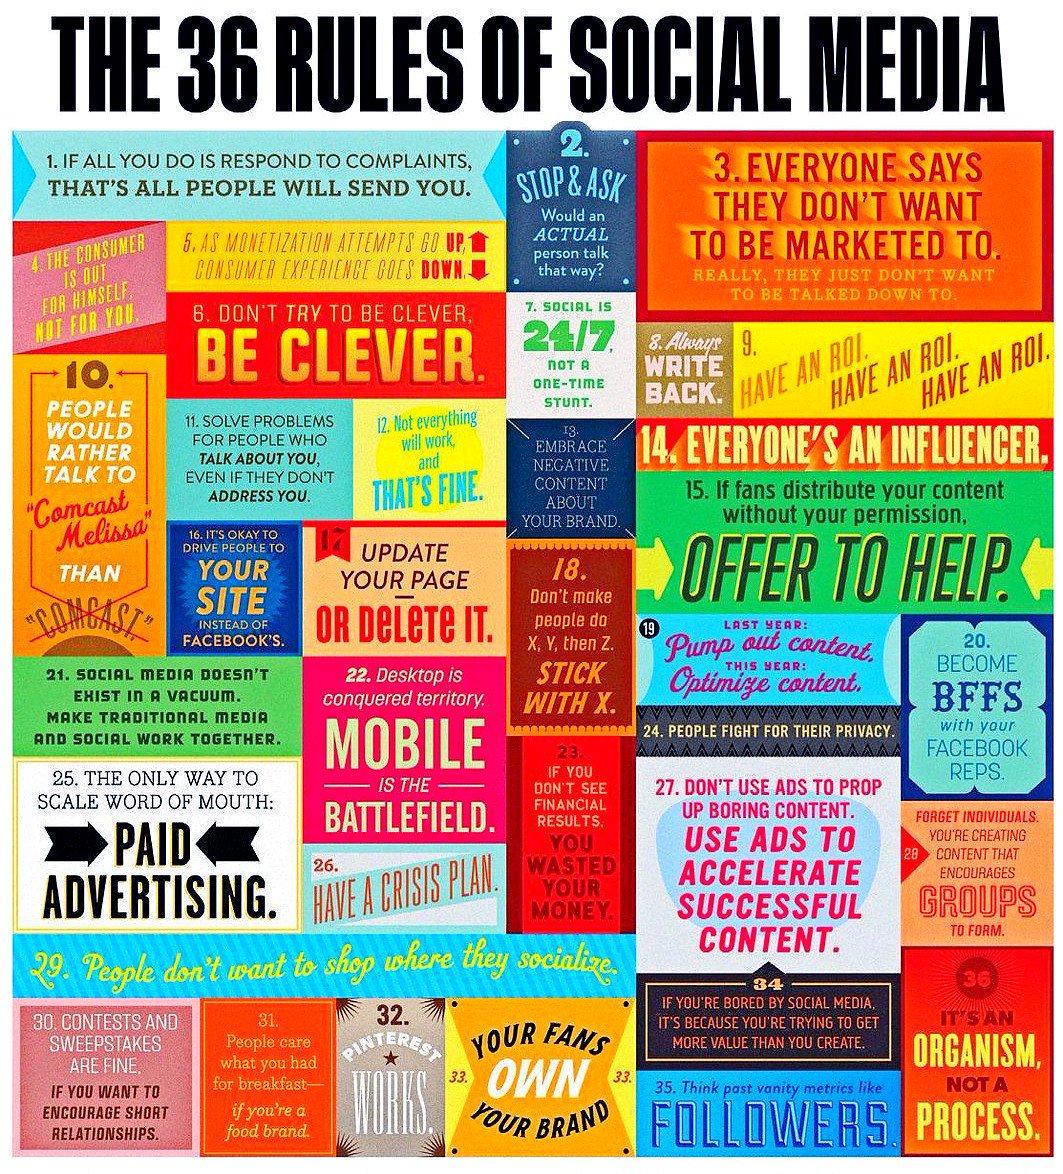 The 36 Rules of Social Media [Infographic]  #SocialMedia #SMM #GrowthHacking #ContentMarketing #DigitalMarketing by #TrapaDrive<br>http://pic.twitter.com/2Ji5LGiQGt